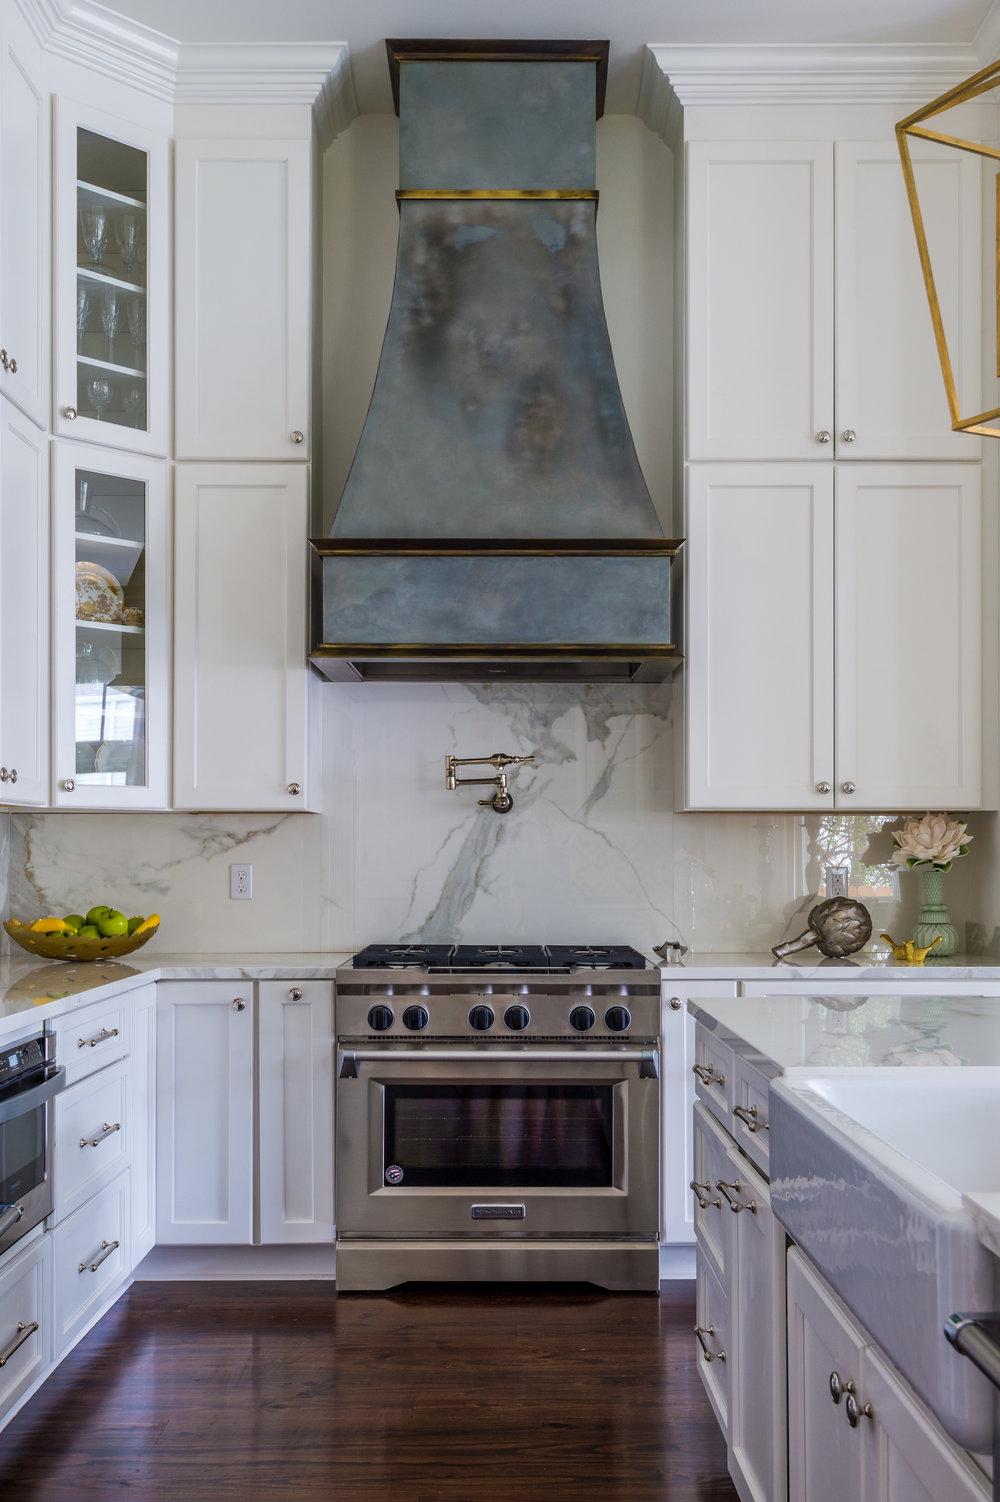 custom kitchen range hood new orleans design style khb interiors